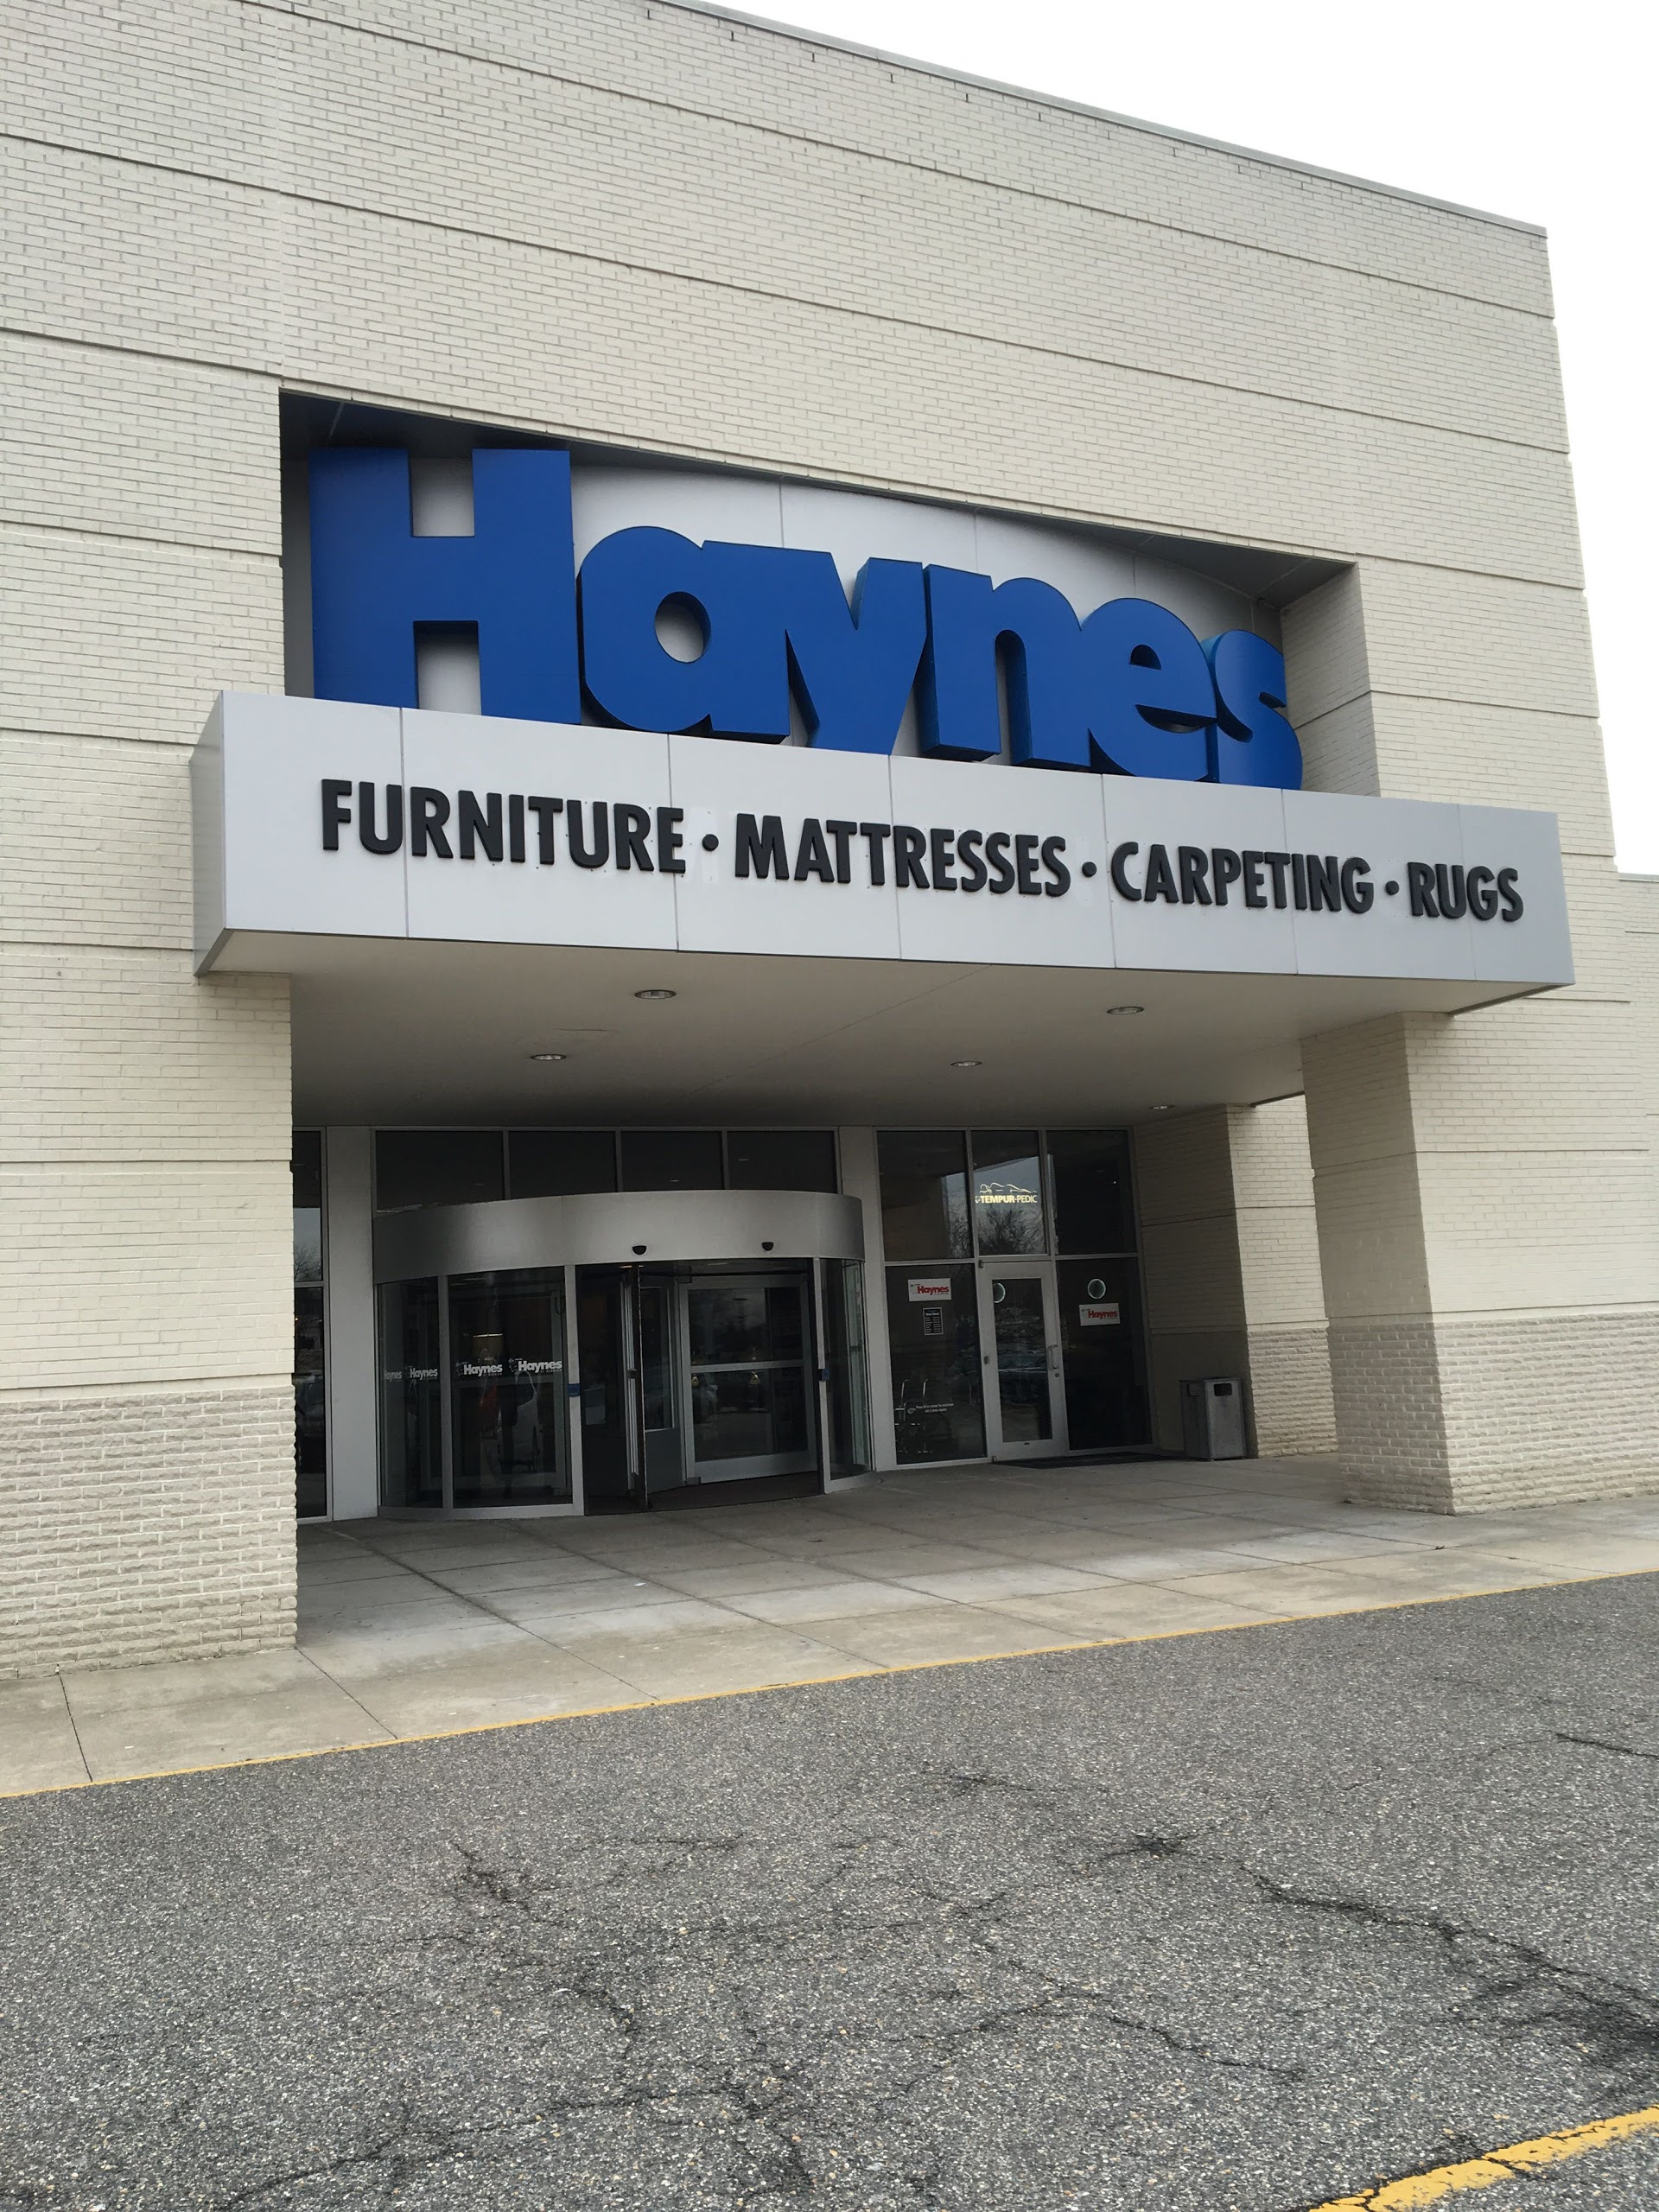 Roberts Furniture amp Mattress in Newport News VA 23608 Citysearch